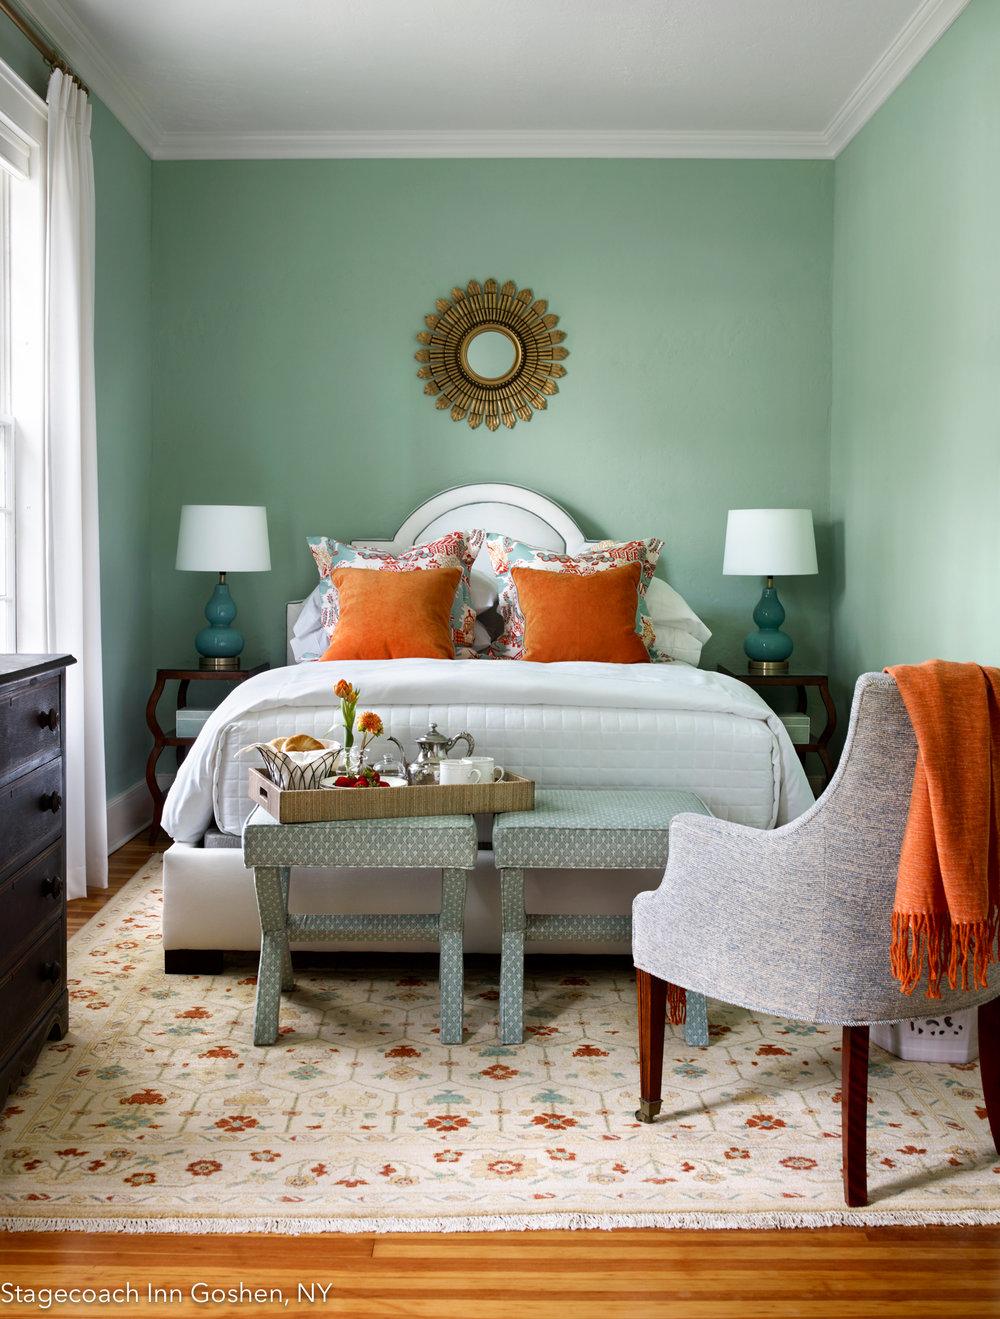 Guggenheim_Bedroom_1.jpg